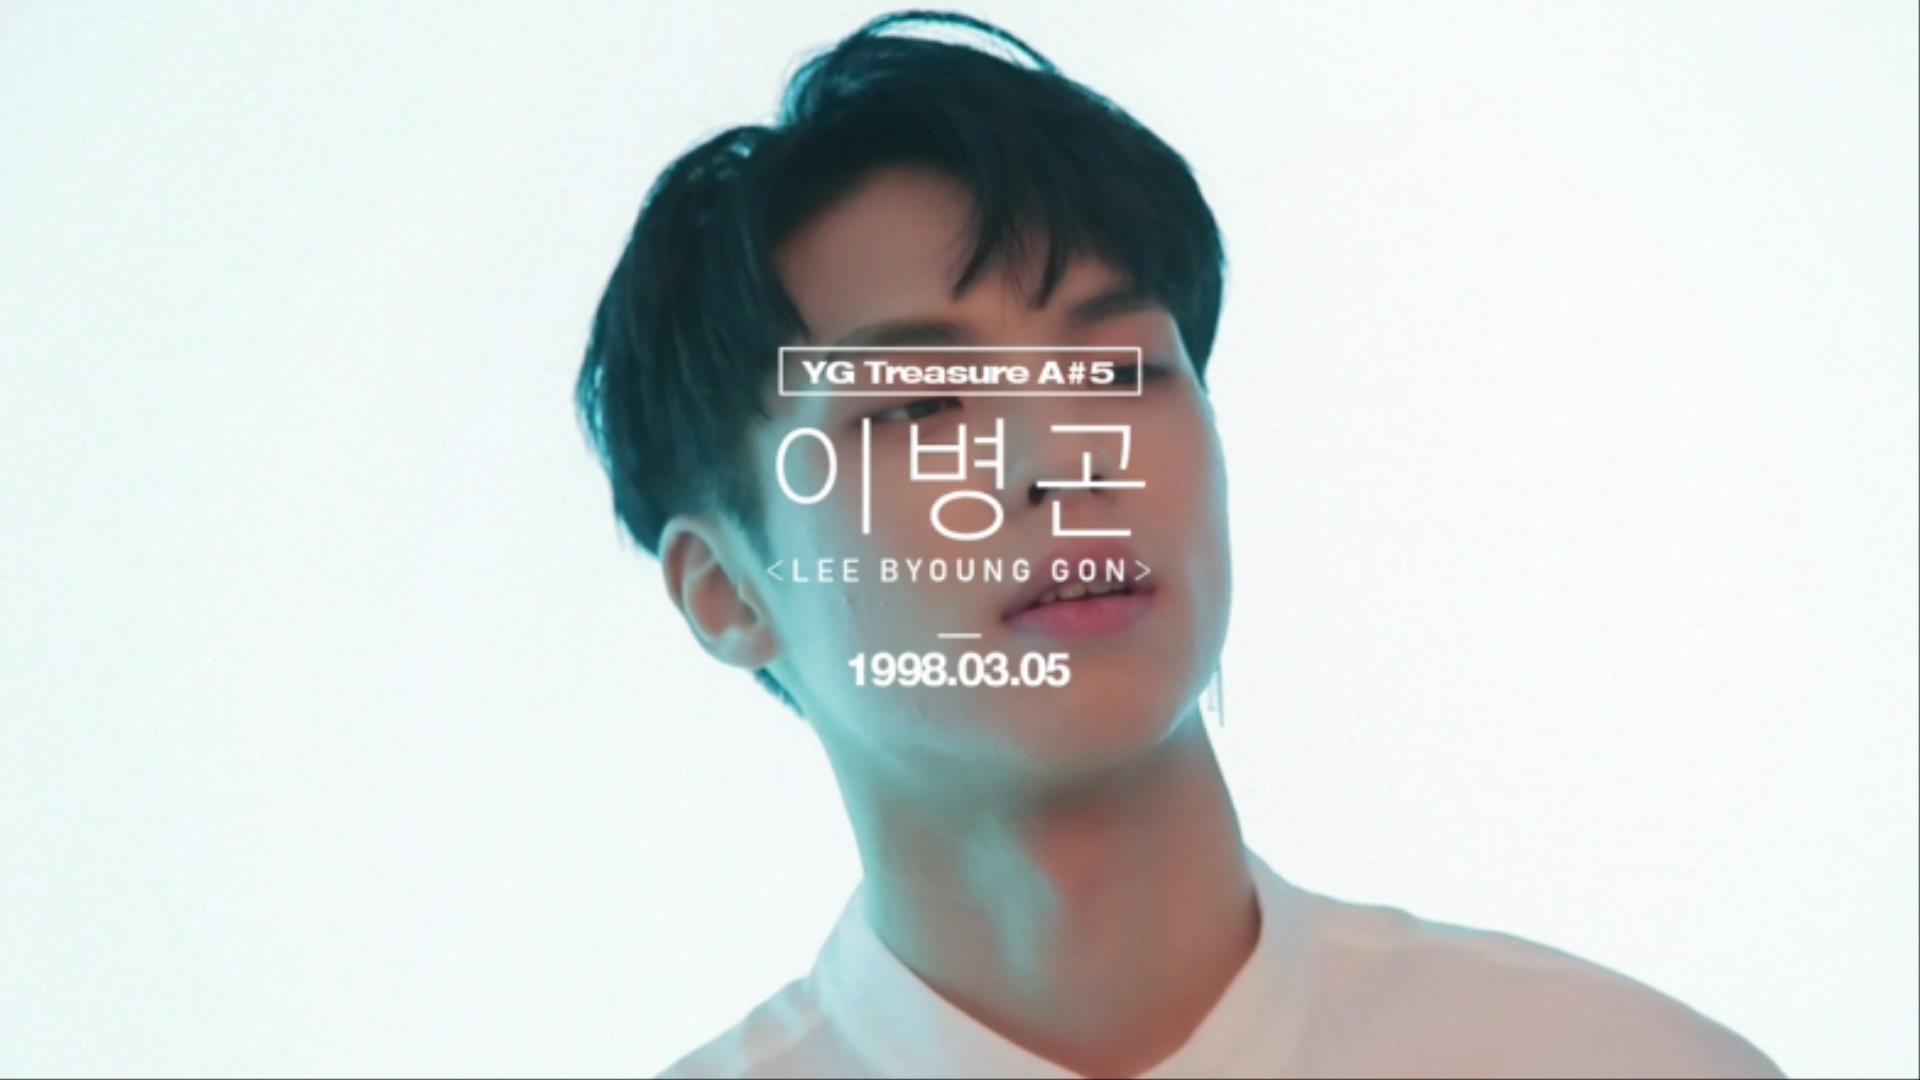 YG보석함ㅣA#5 이병곤 <LEE BYOUNGGON> PROFILE MAKING FILM